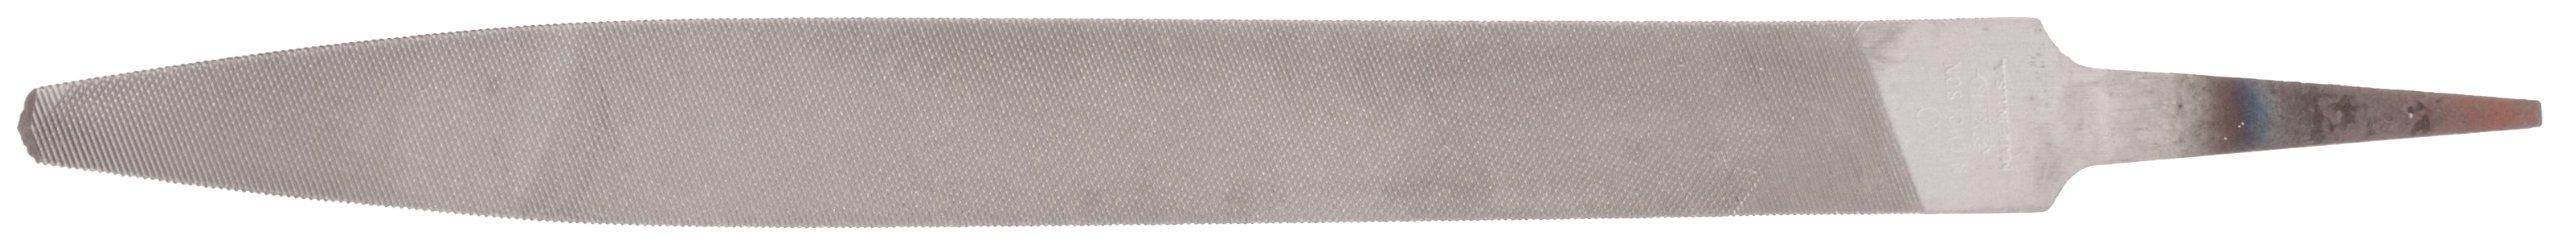 Nicholson Hand File, Swiss Pattern, Double Cut, Half-Round, #0 Coarseness, 8'' Length